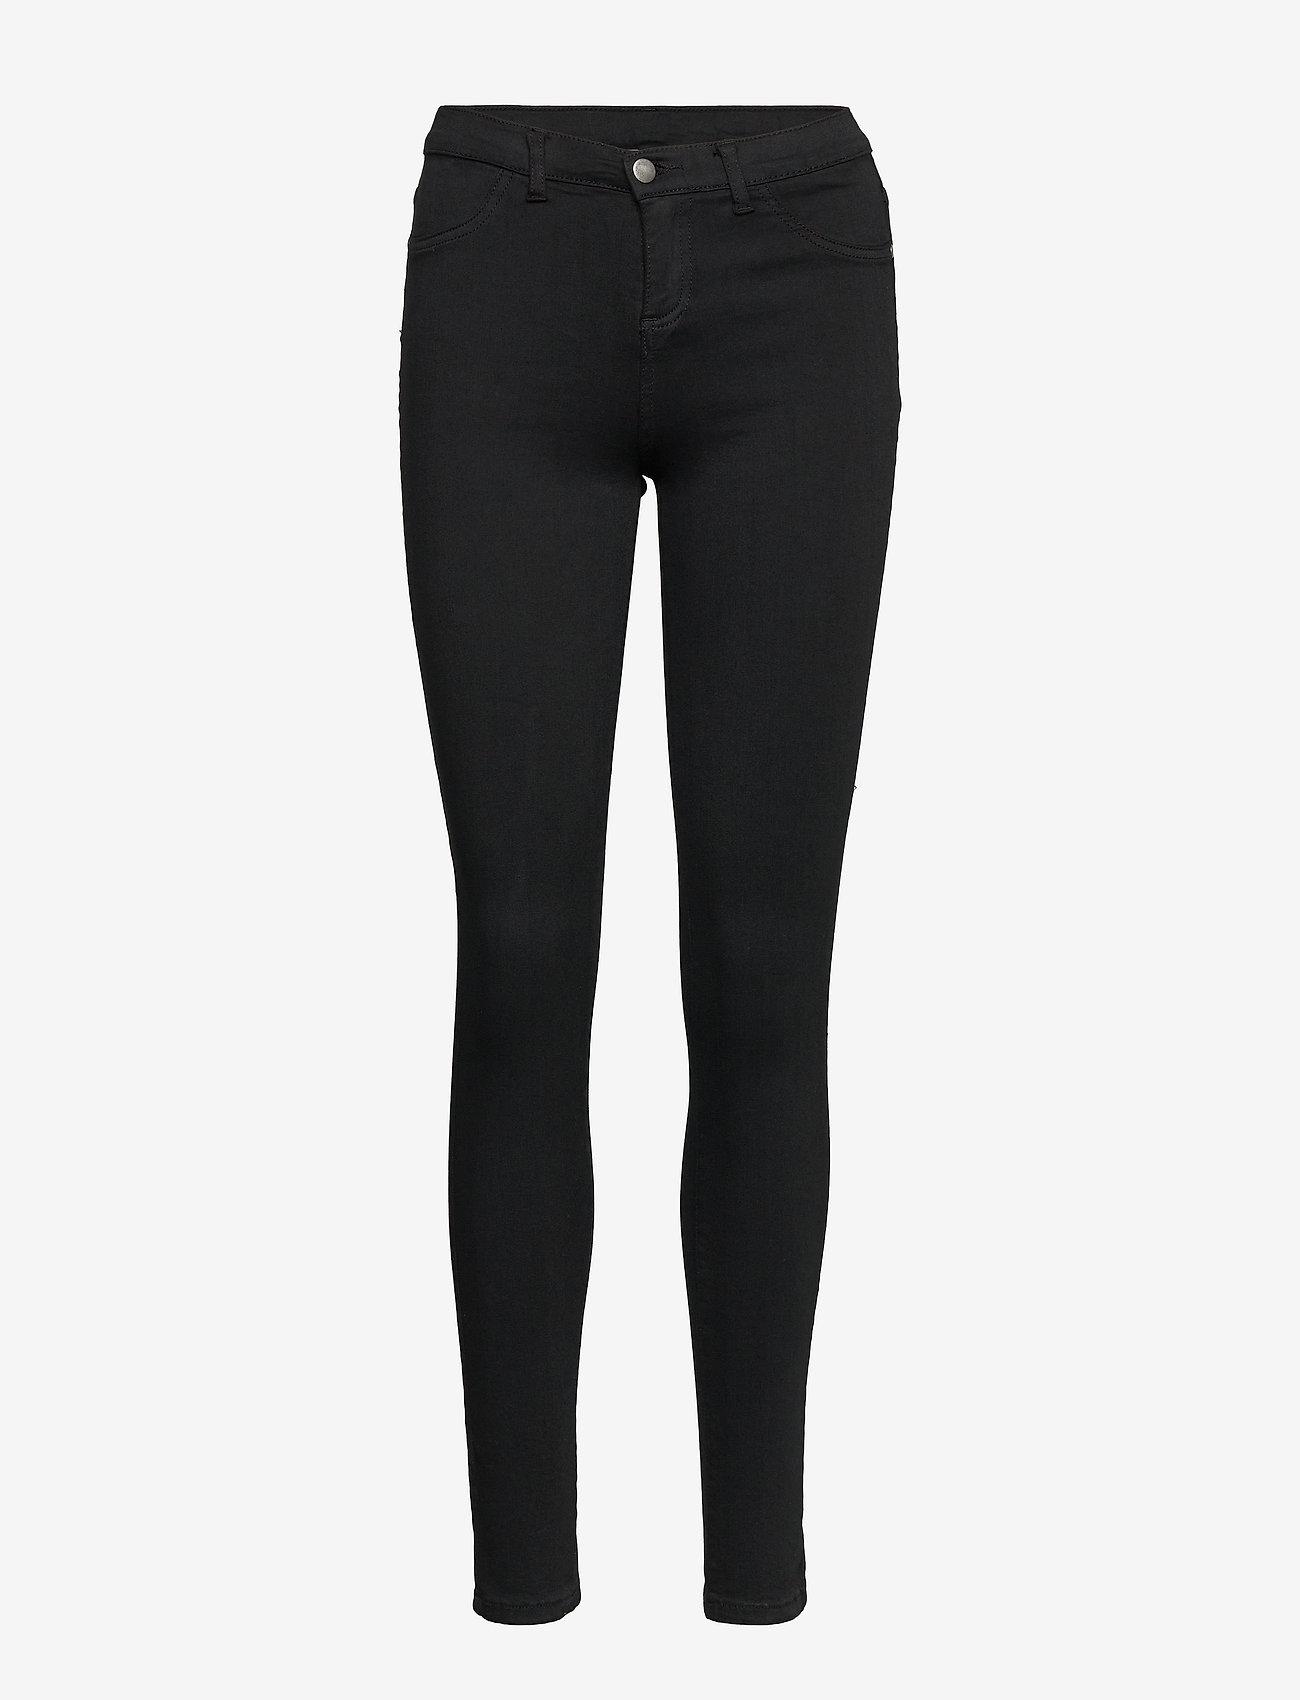 SPARKZ COPENHAGEN - CHRISTA BLACK PANTS - broeken med skinny fit - black - 0